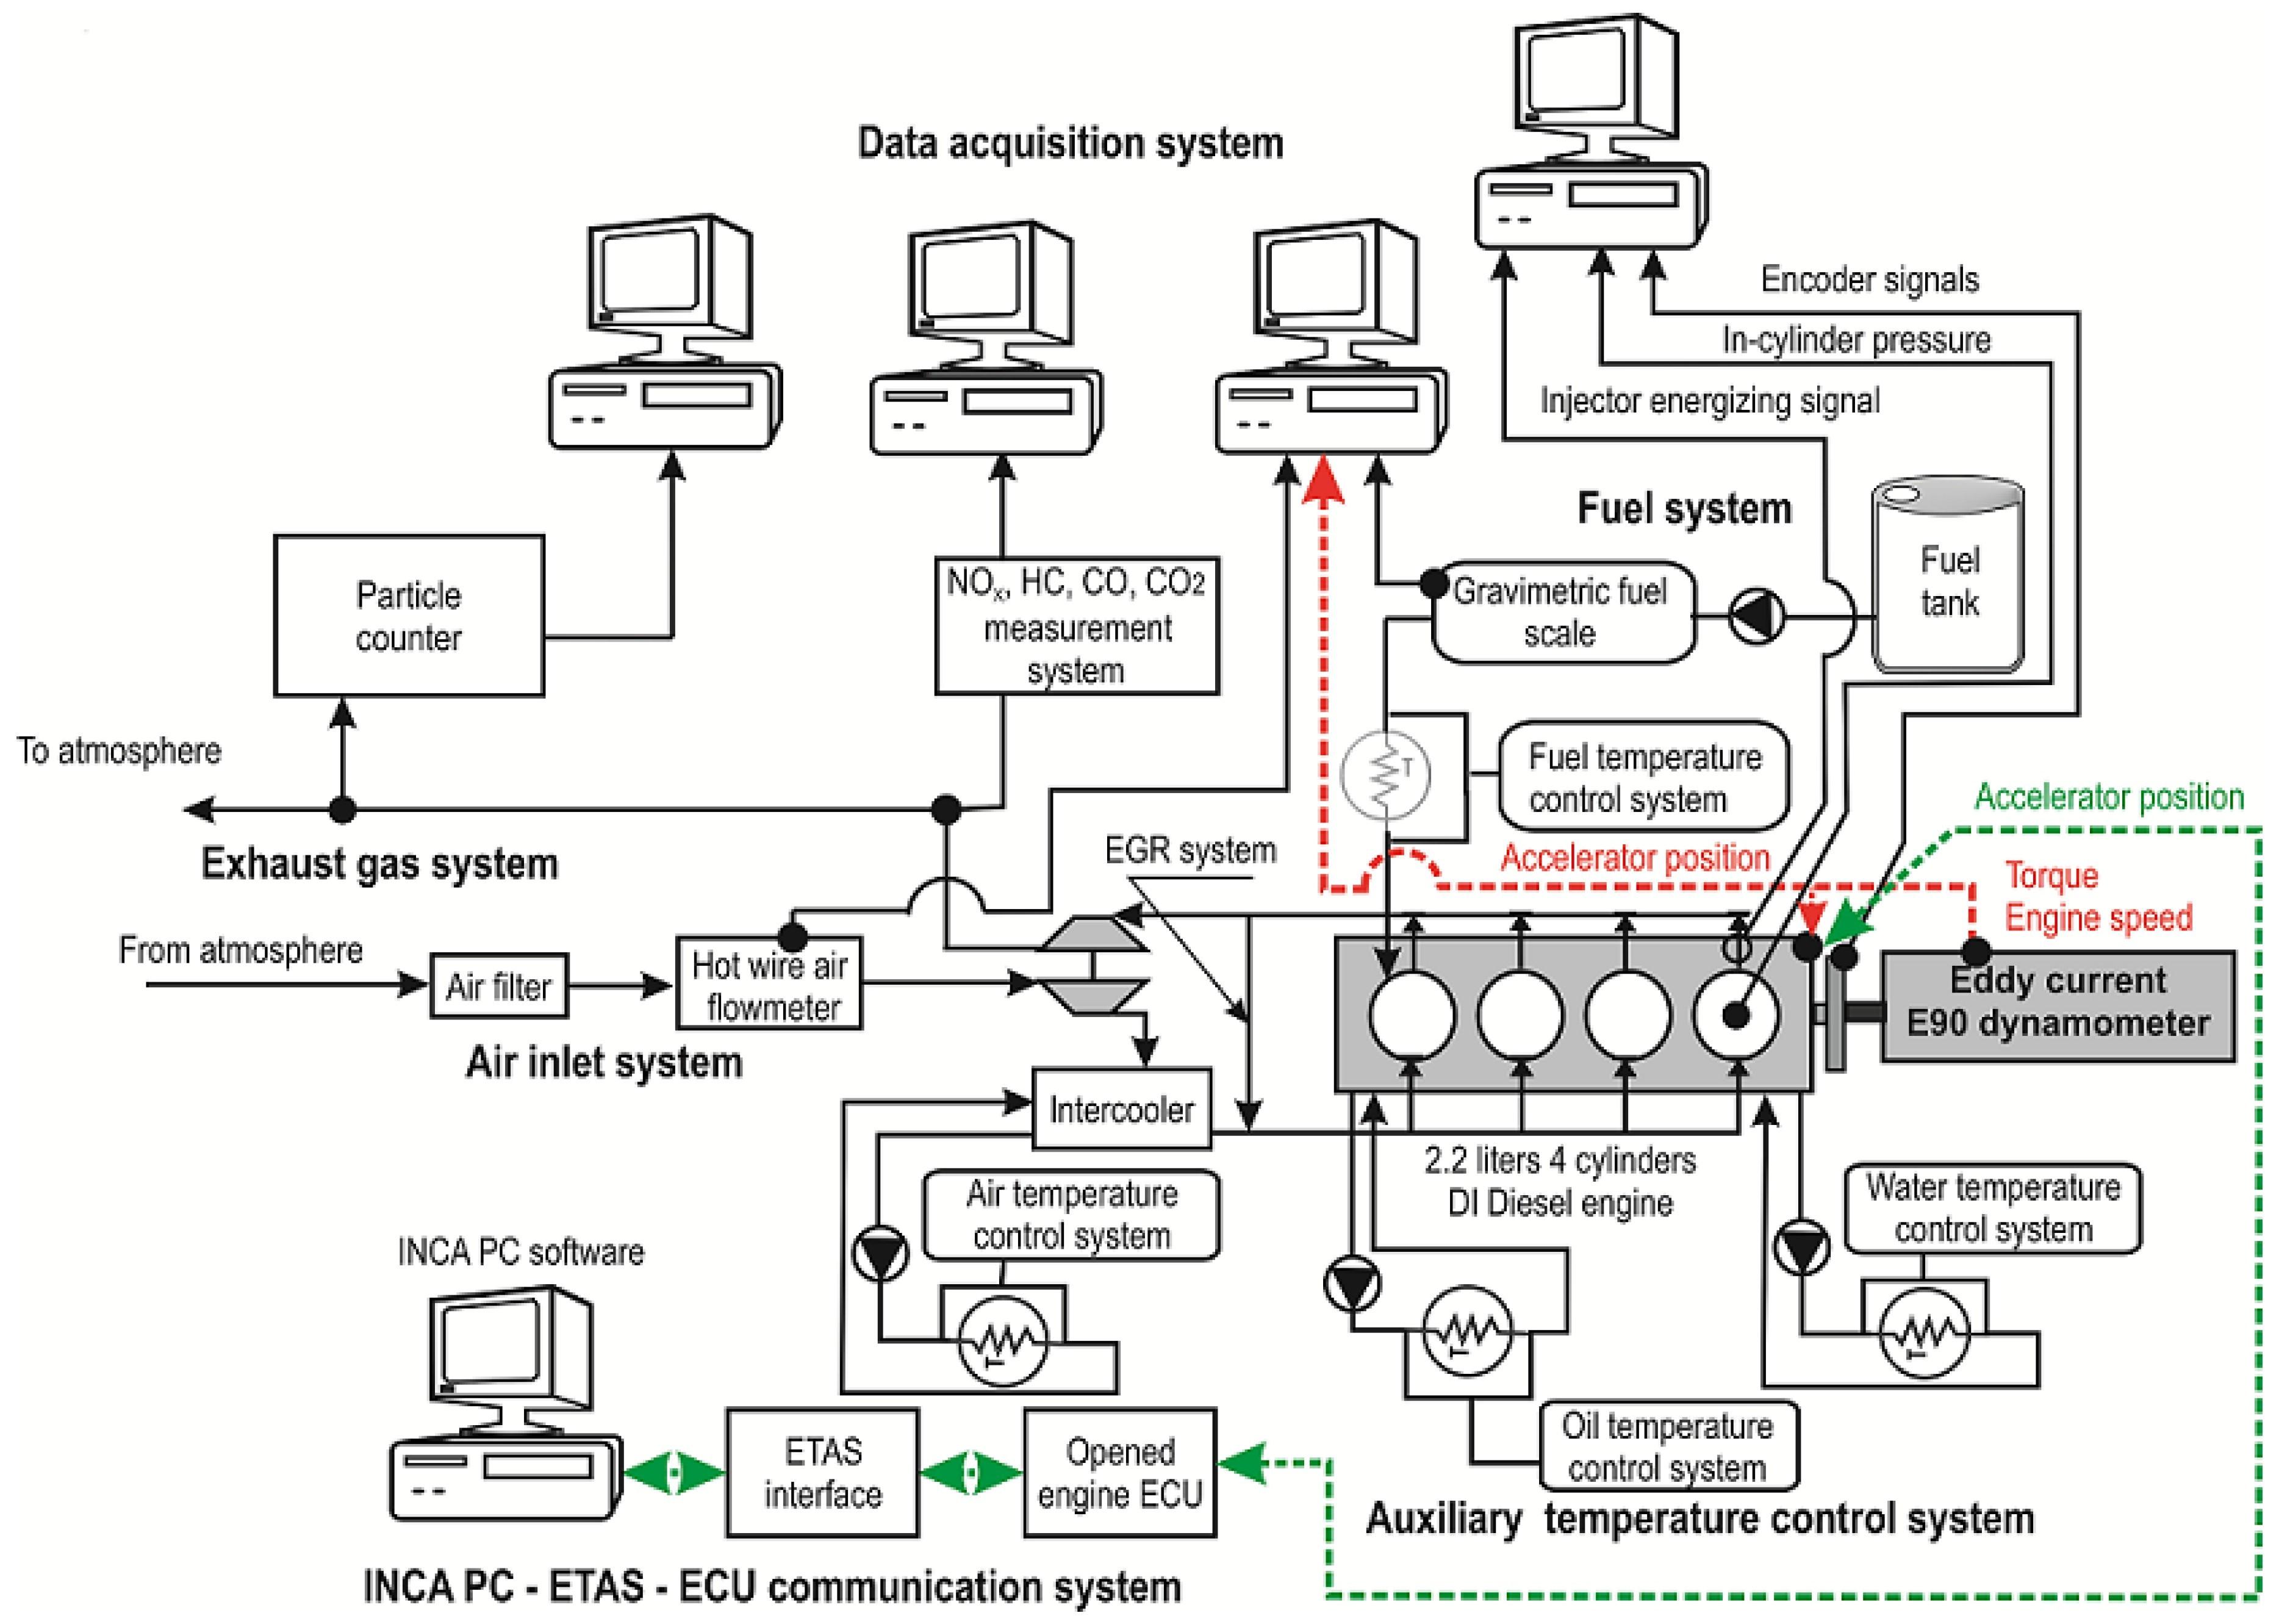 Peachy Actual Engine Indicator Diagram Auto Electrical Wiring Diagram Wiring Cloud Picalendutblikvittorg